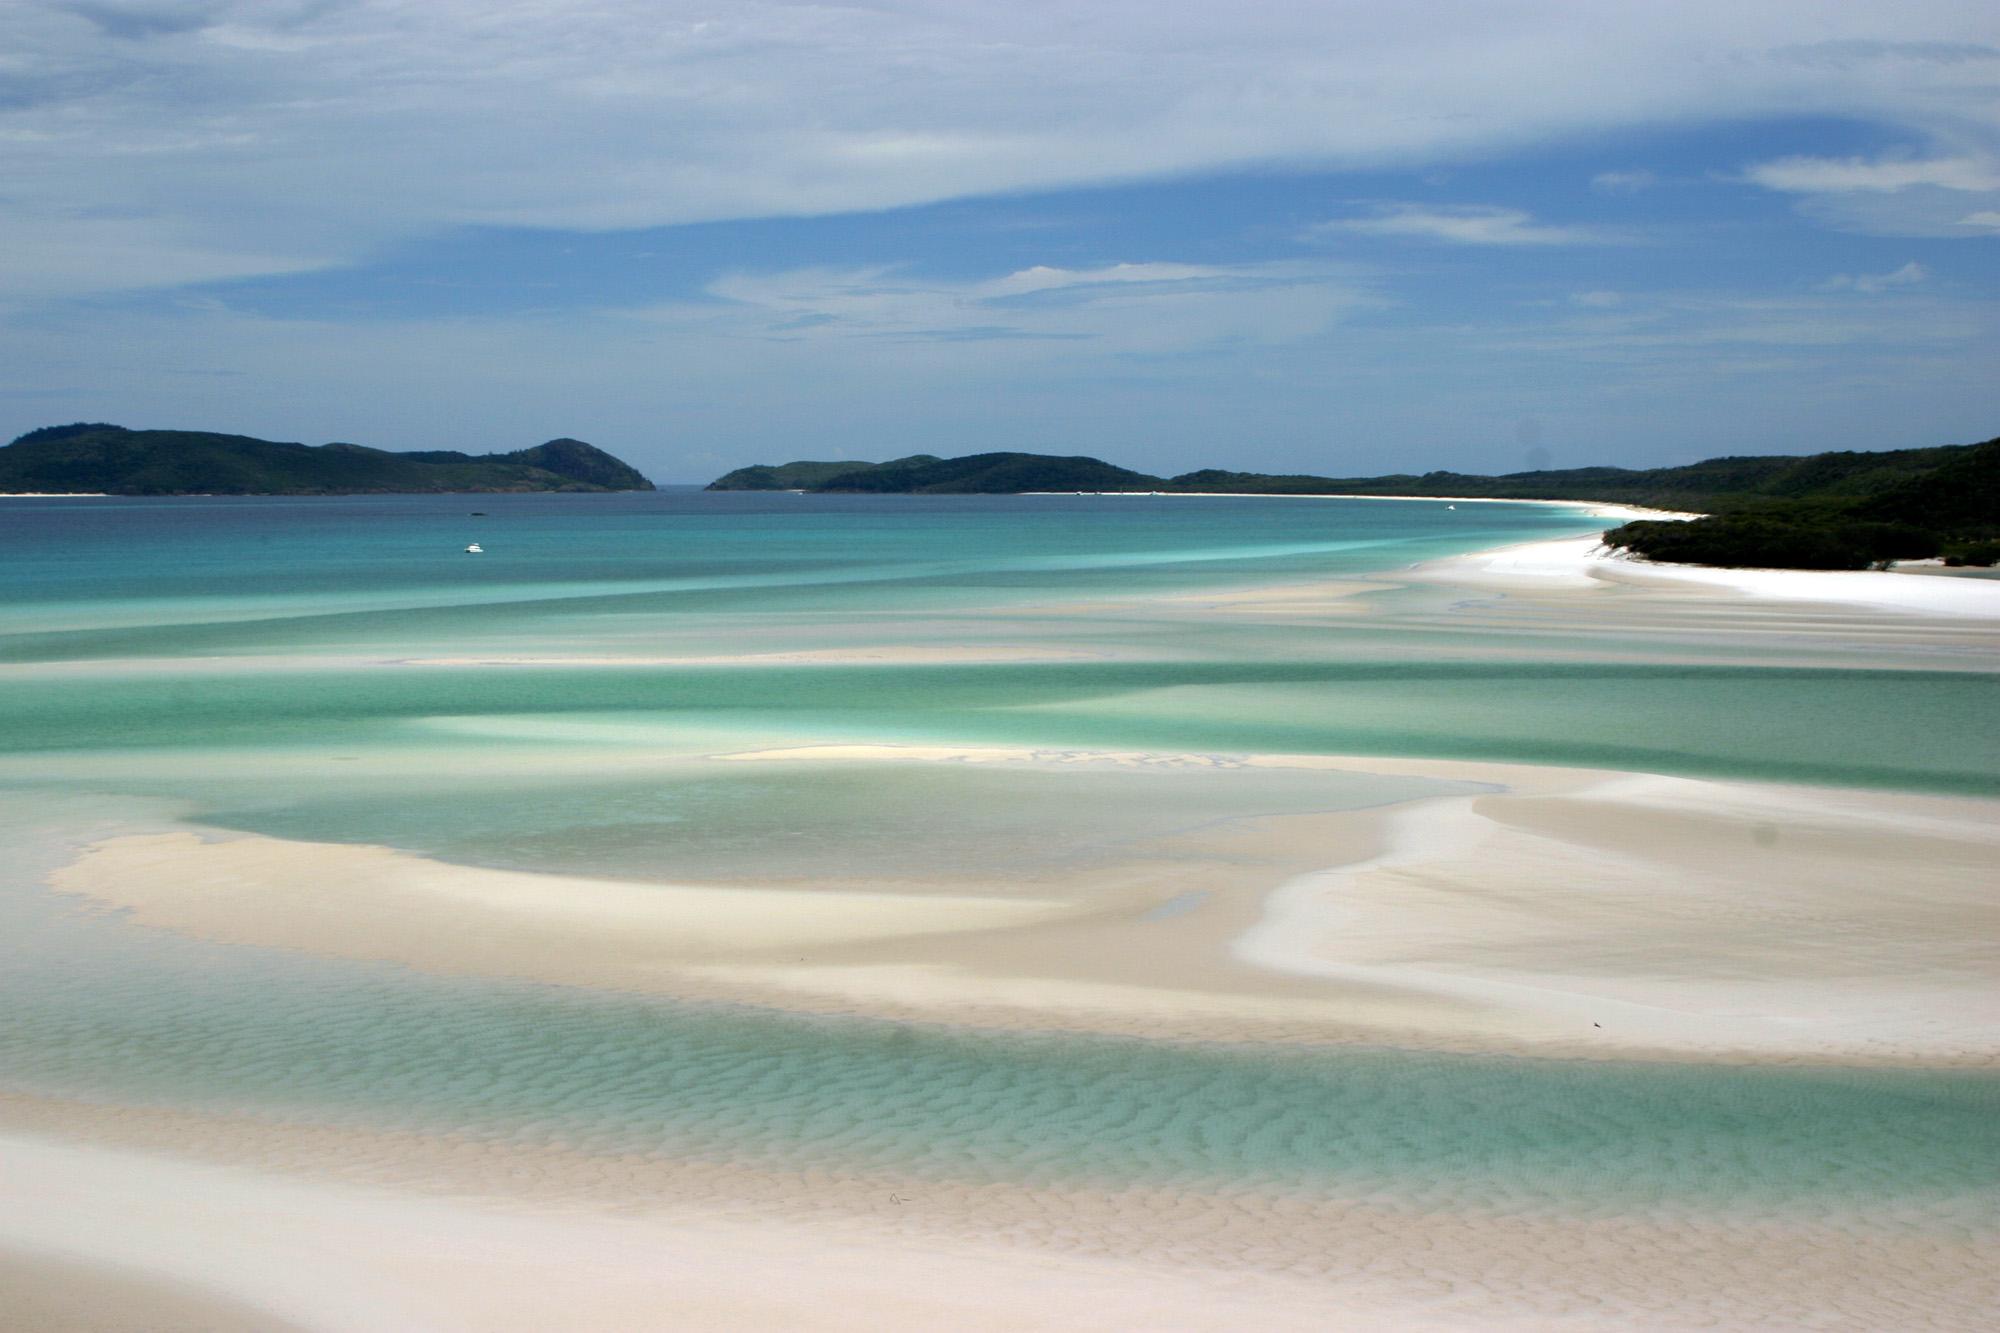 Whitehaven-Beach-Whitsunday-Island-Whitsundays-13